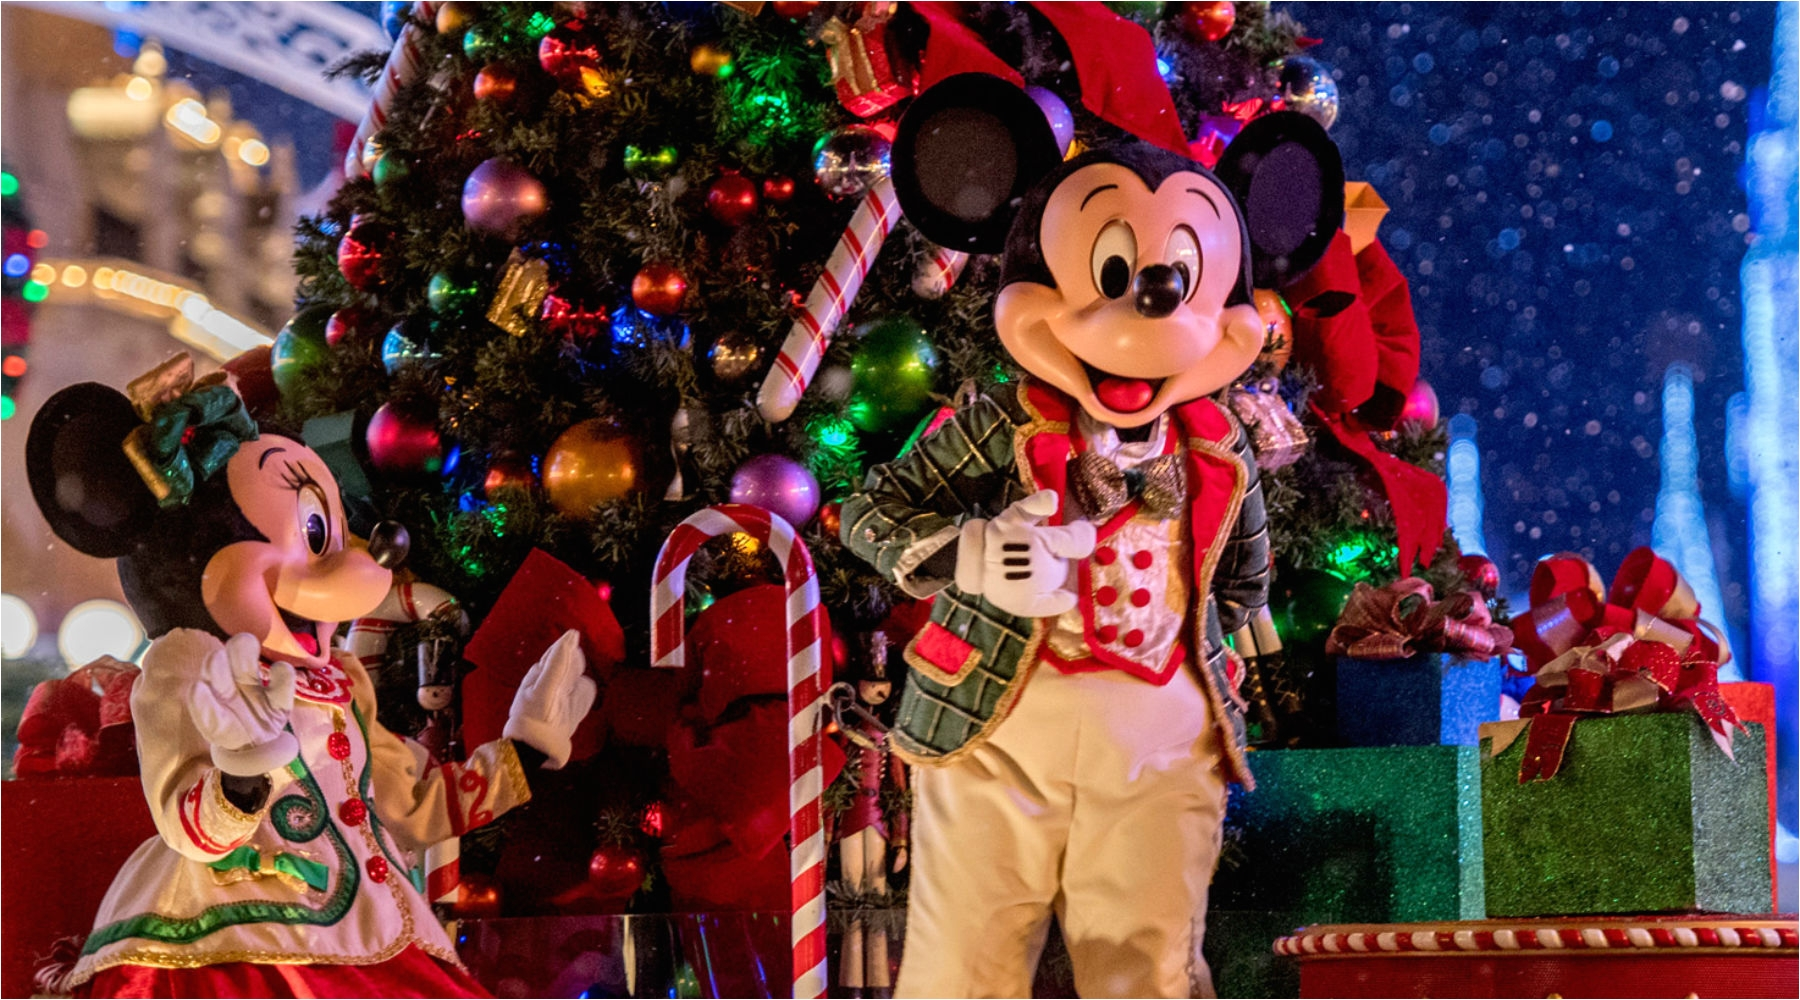 Best Christmas Decorations at Disney World Things to Do for Christmas with Kids at Disney World Minitime